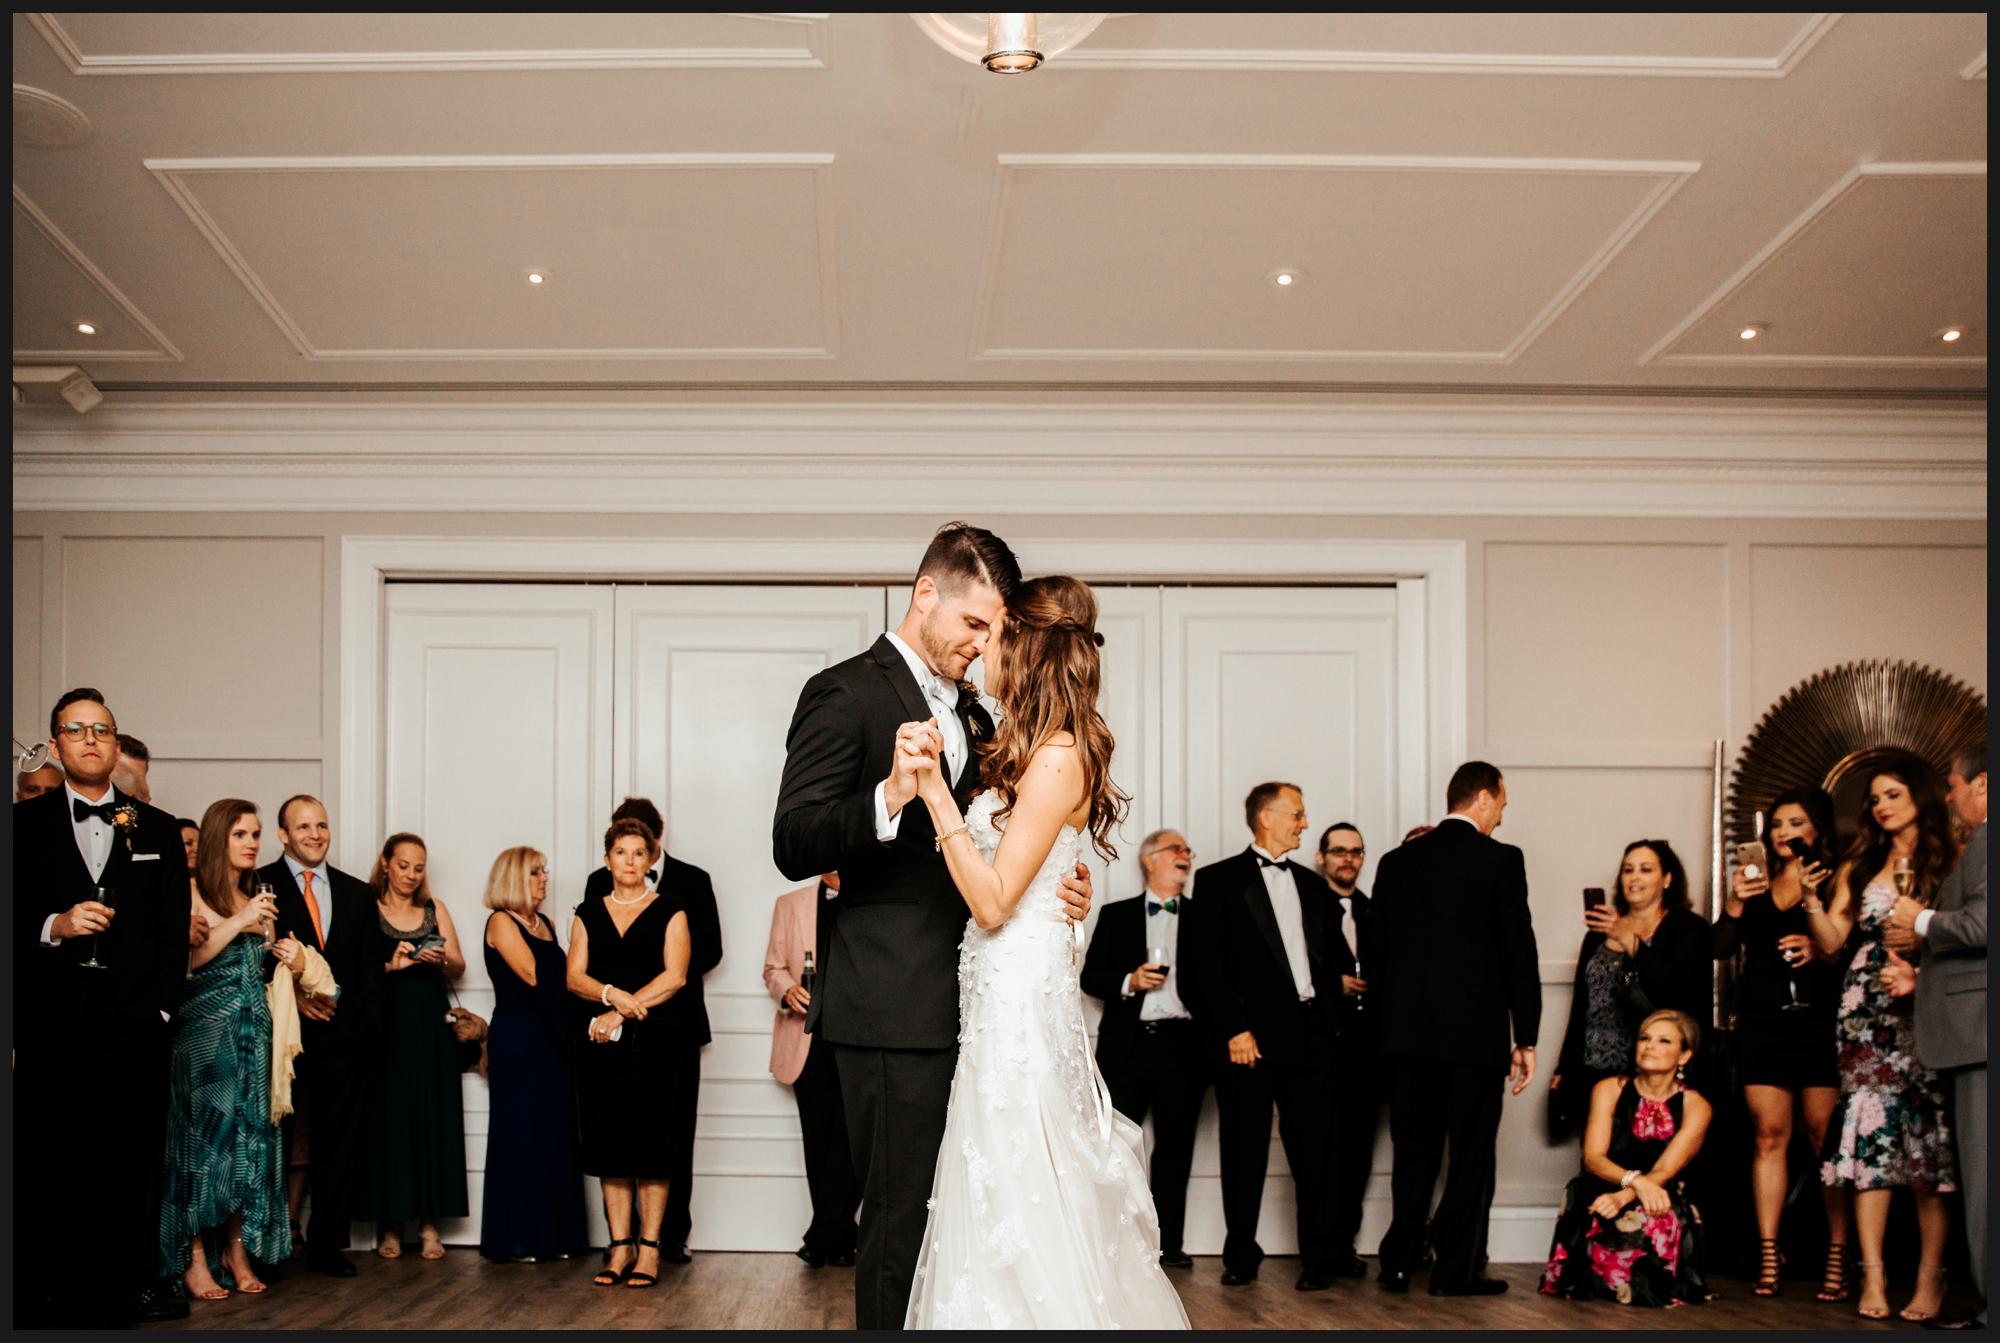 Orlando-Wedding-Photographer-destination-wedding-photographer-florida-wedding-photographer-hawaii-wedding-photographer_0250.jpg